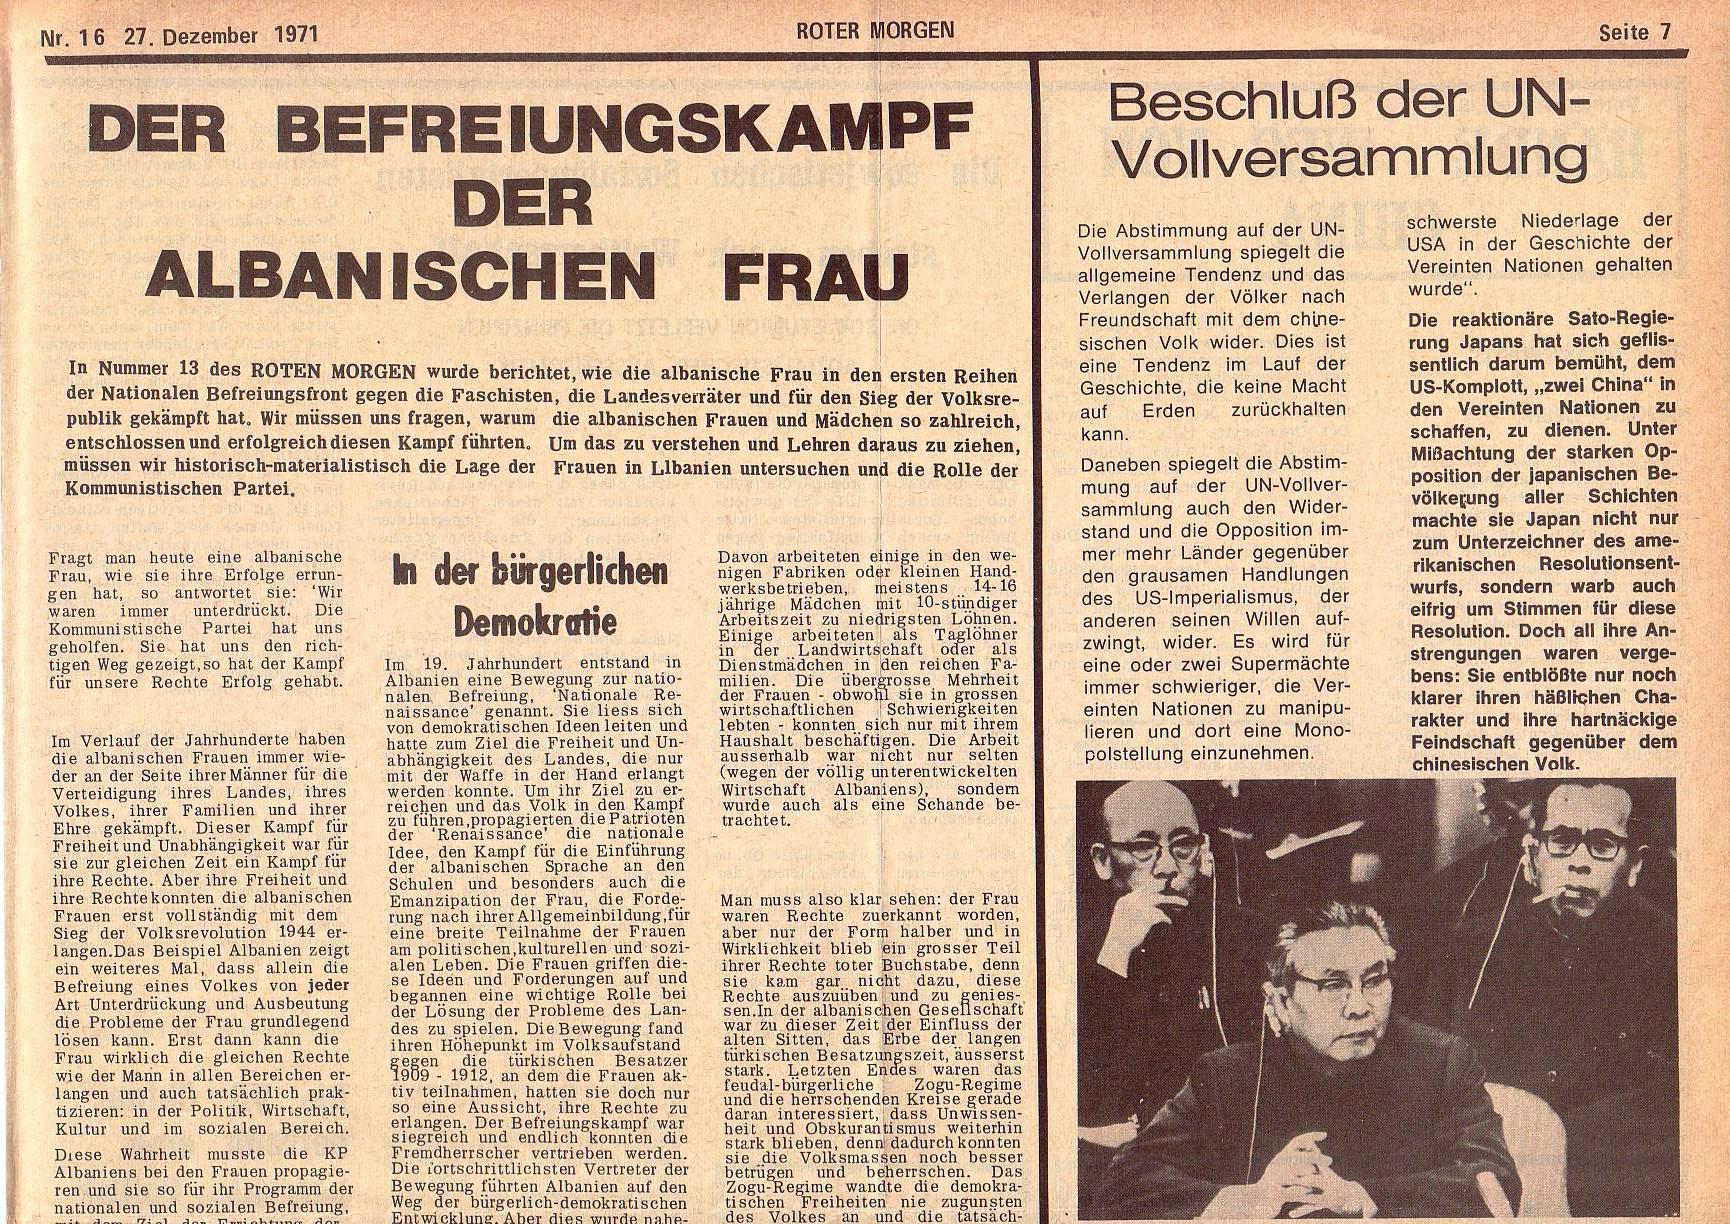 Roter Morgen, 5. Jg., 27. Dezember 1971, Nr. 16, Seite 7a